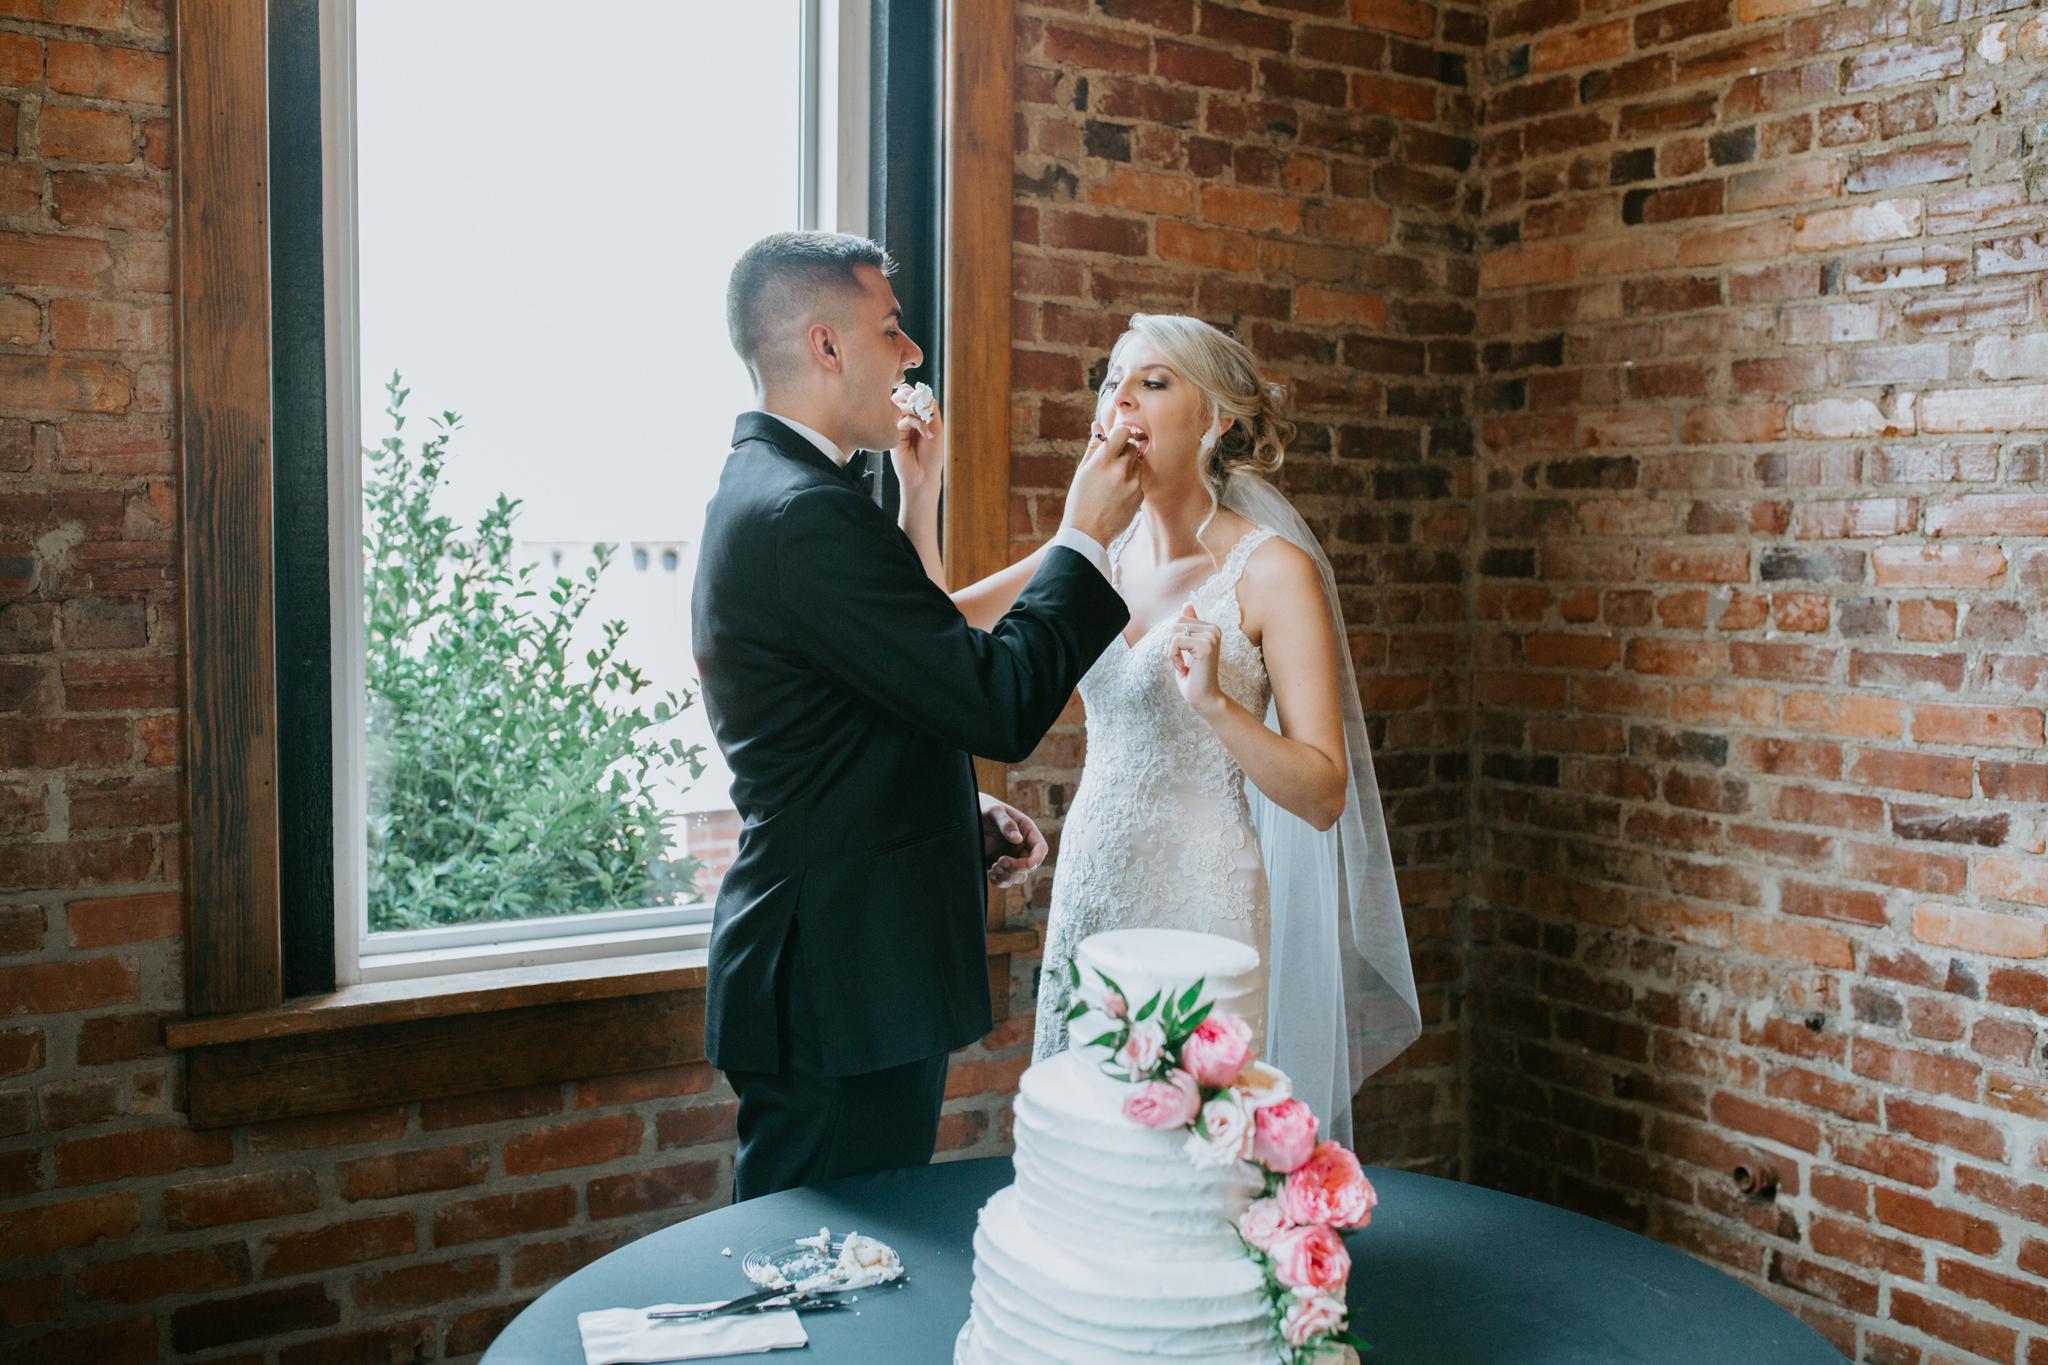 Kayley + Robert + Chattanooga + Nashville + Tennessee + Wedding + Photographer-7.jpg